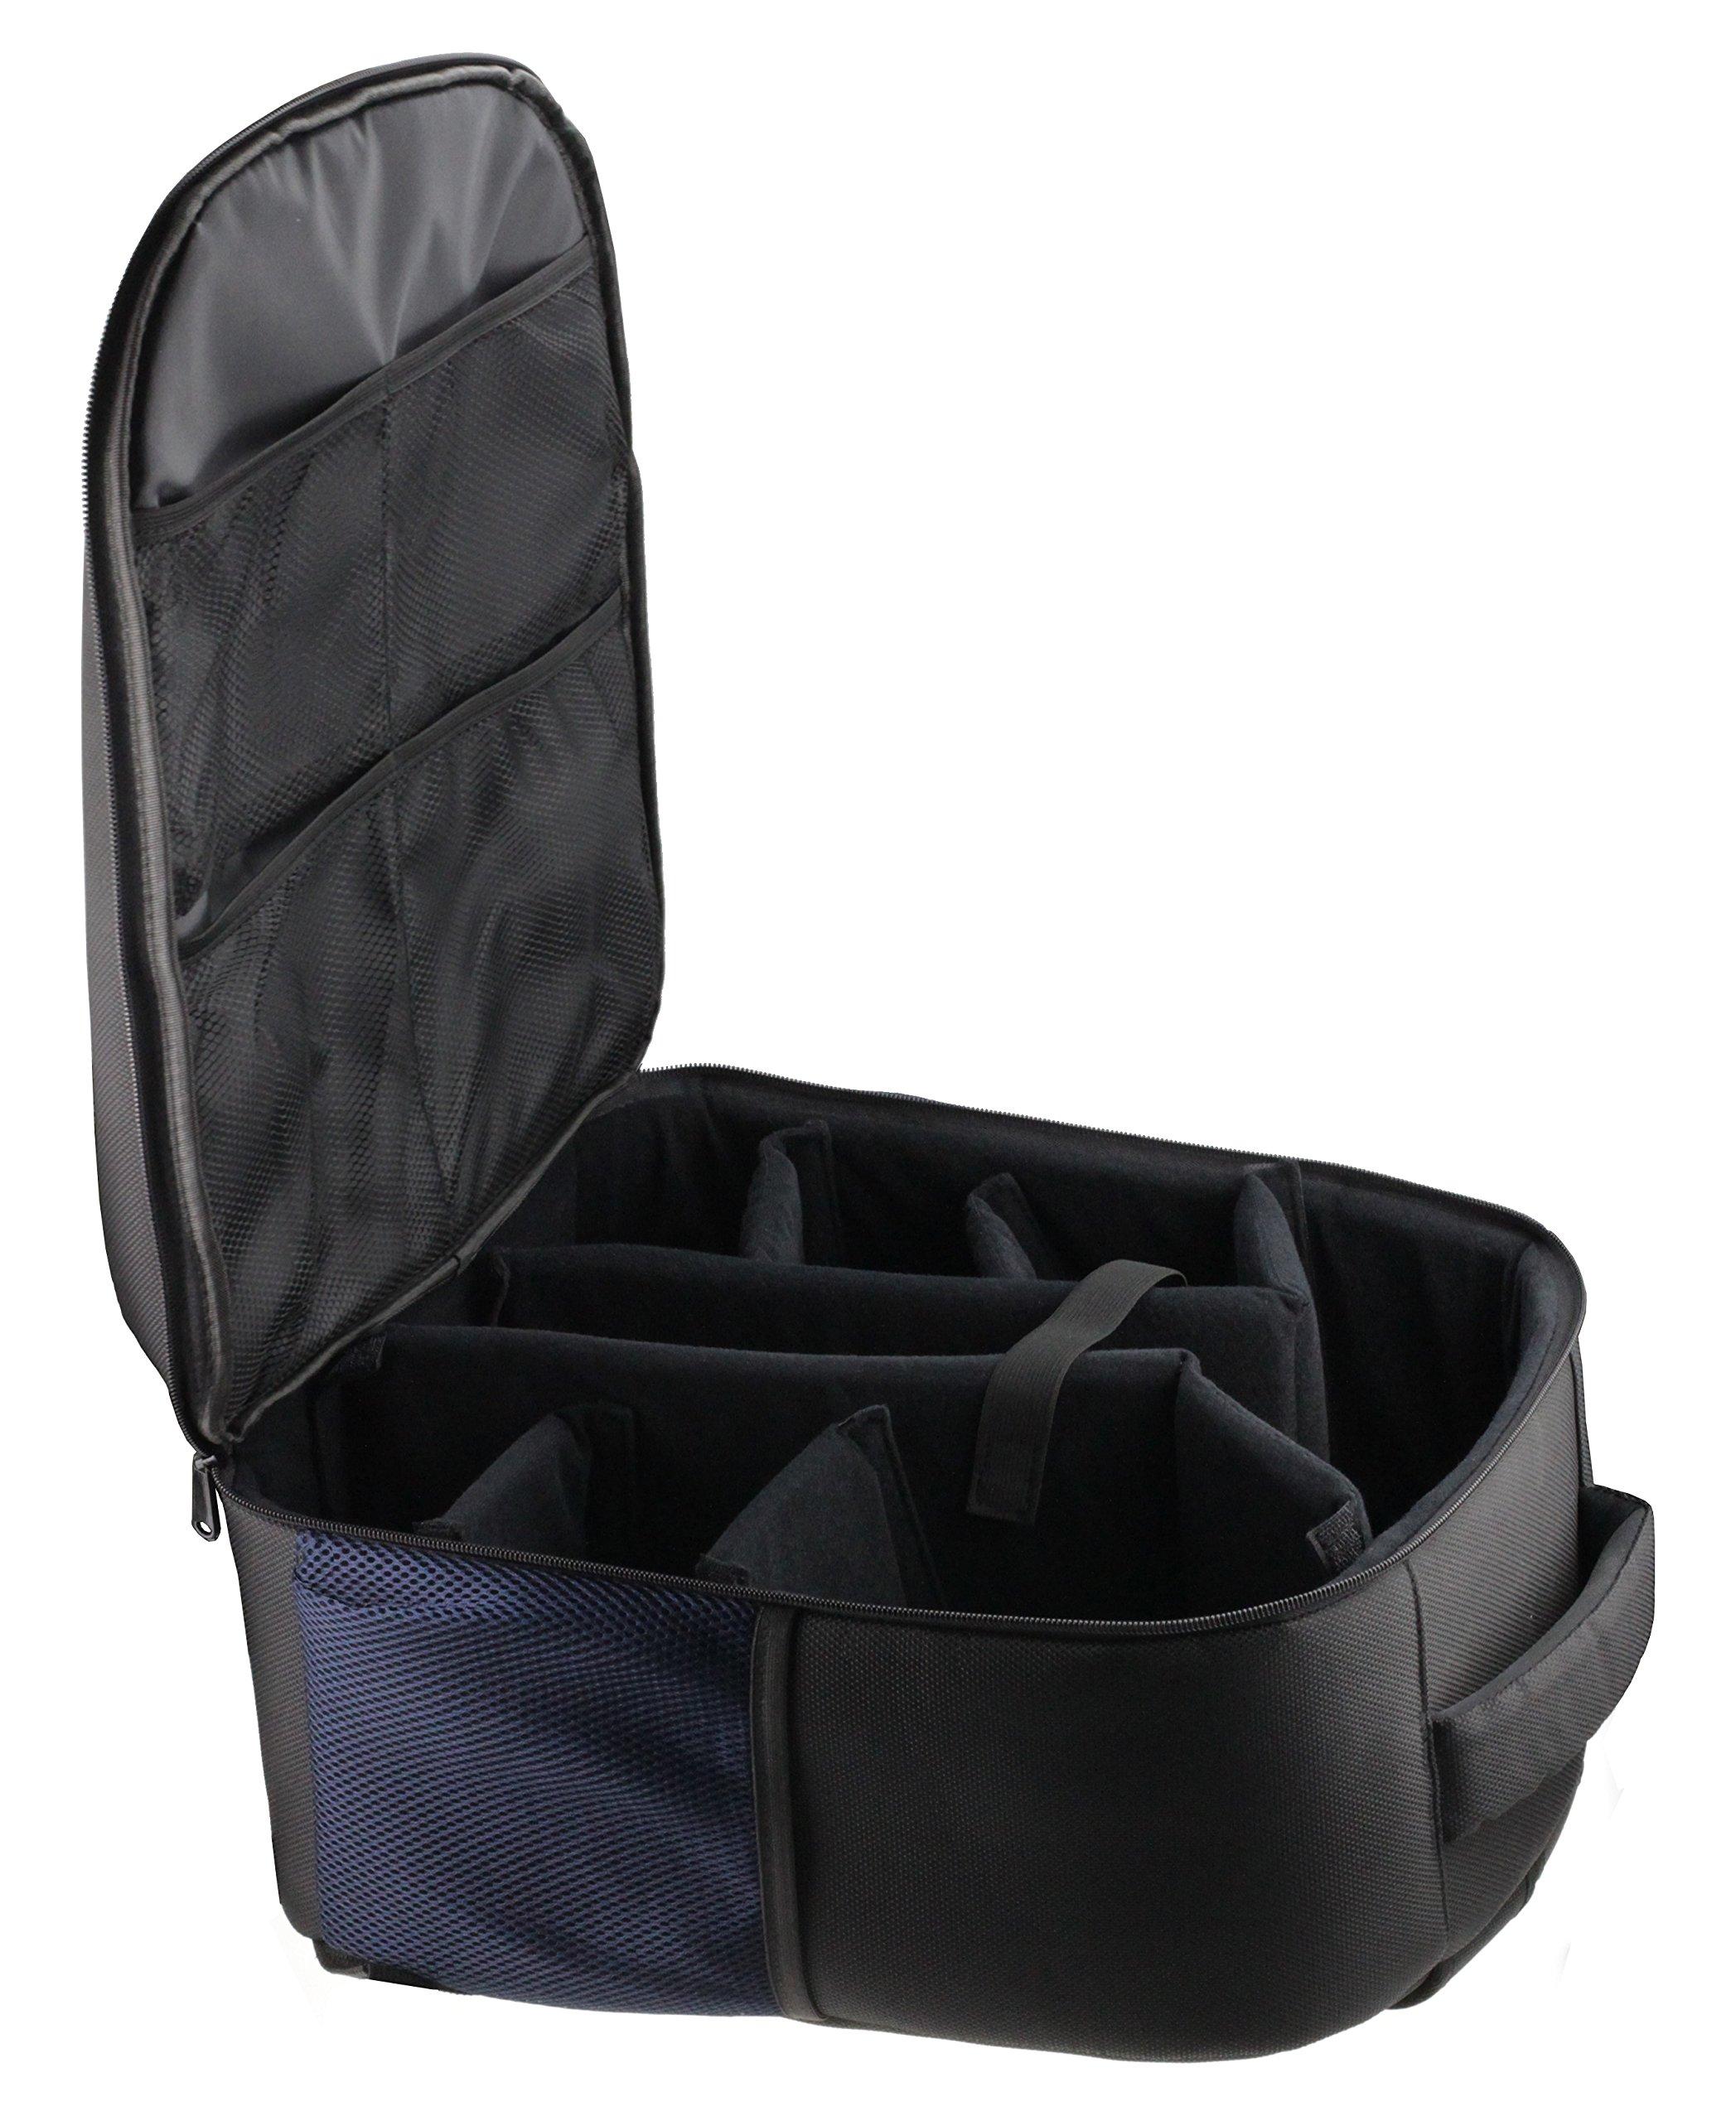 Navitech Rugged Black Backpack/Rucksack for The Oculus Rift + Oculus Touch Controller by Navitech (Image #3)